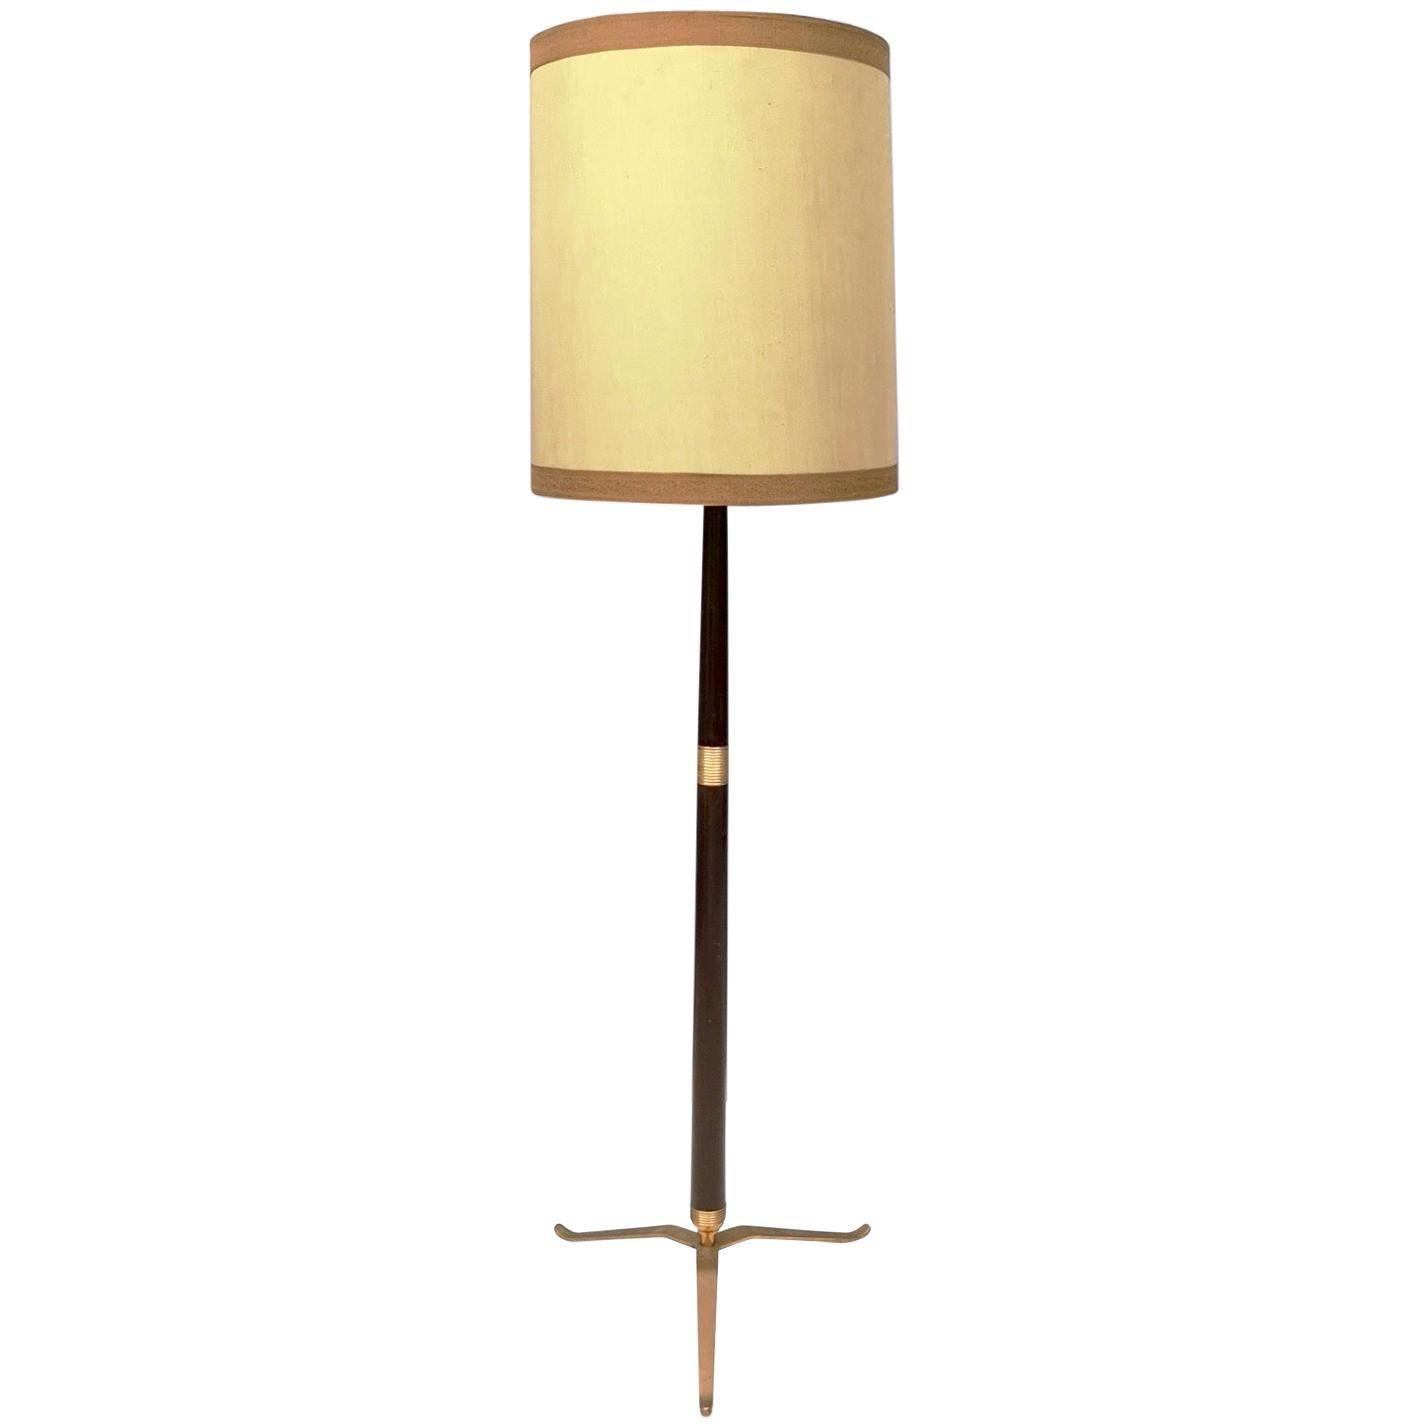 Elegant Midcentury Wood, Brass and Varnished Metal Floor Lamp, Italy, 1950s